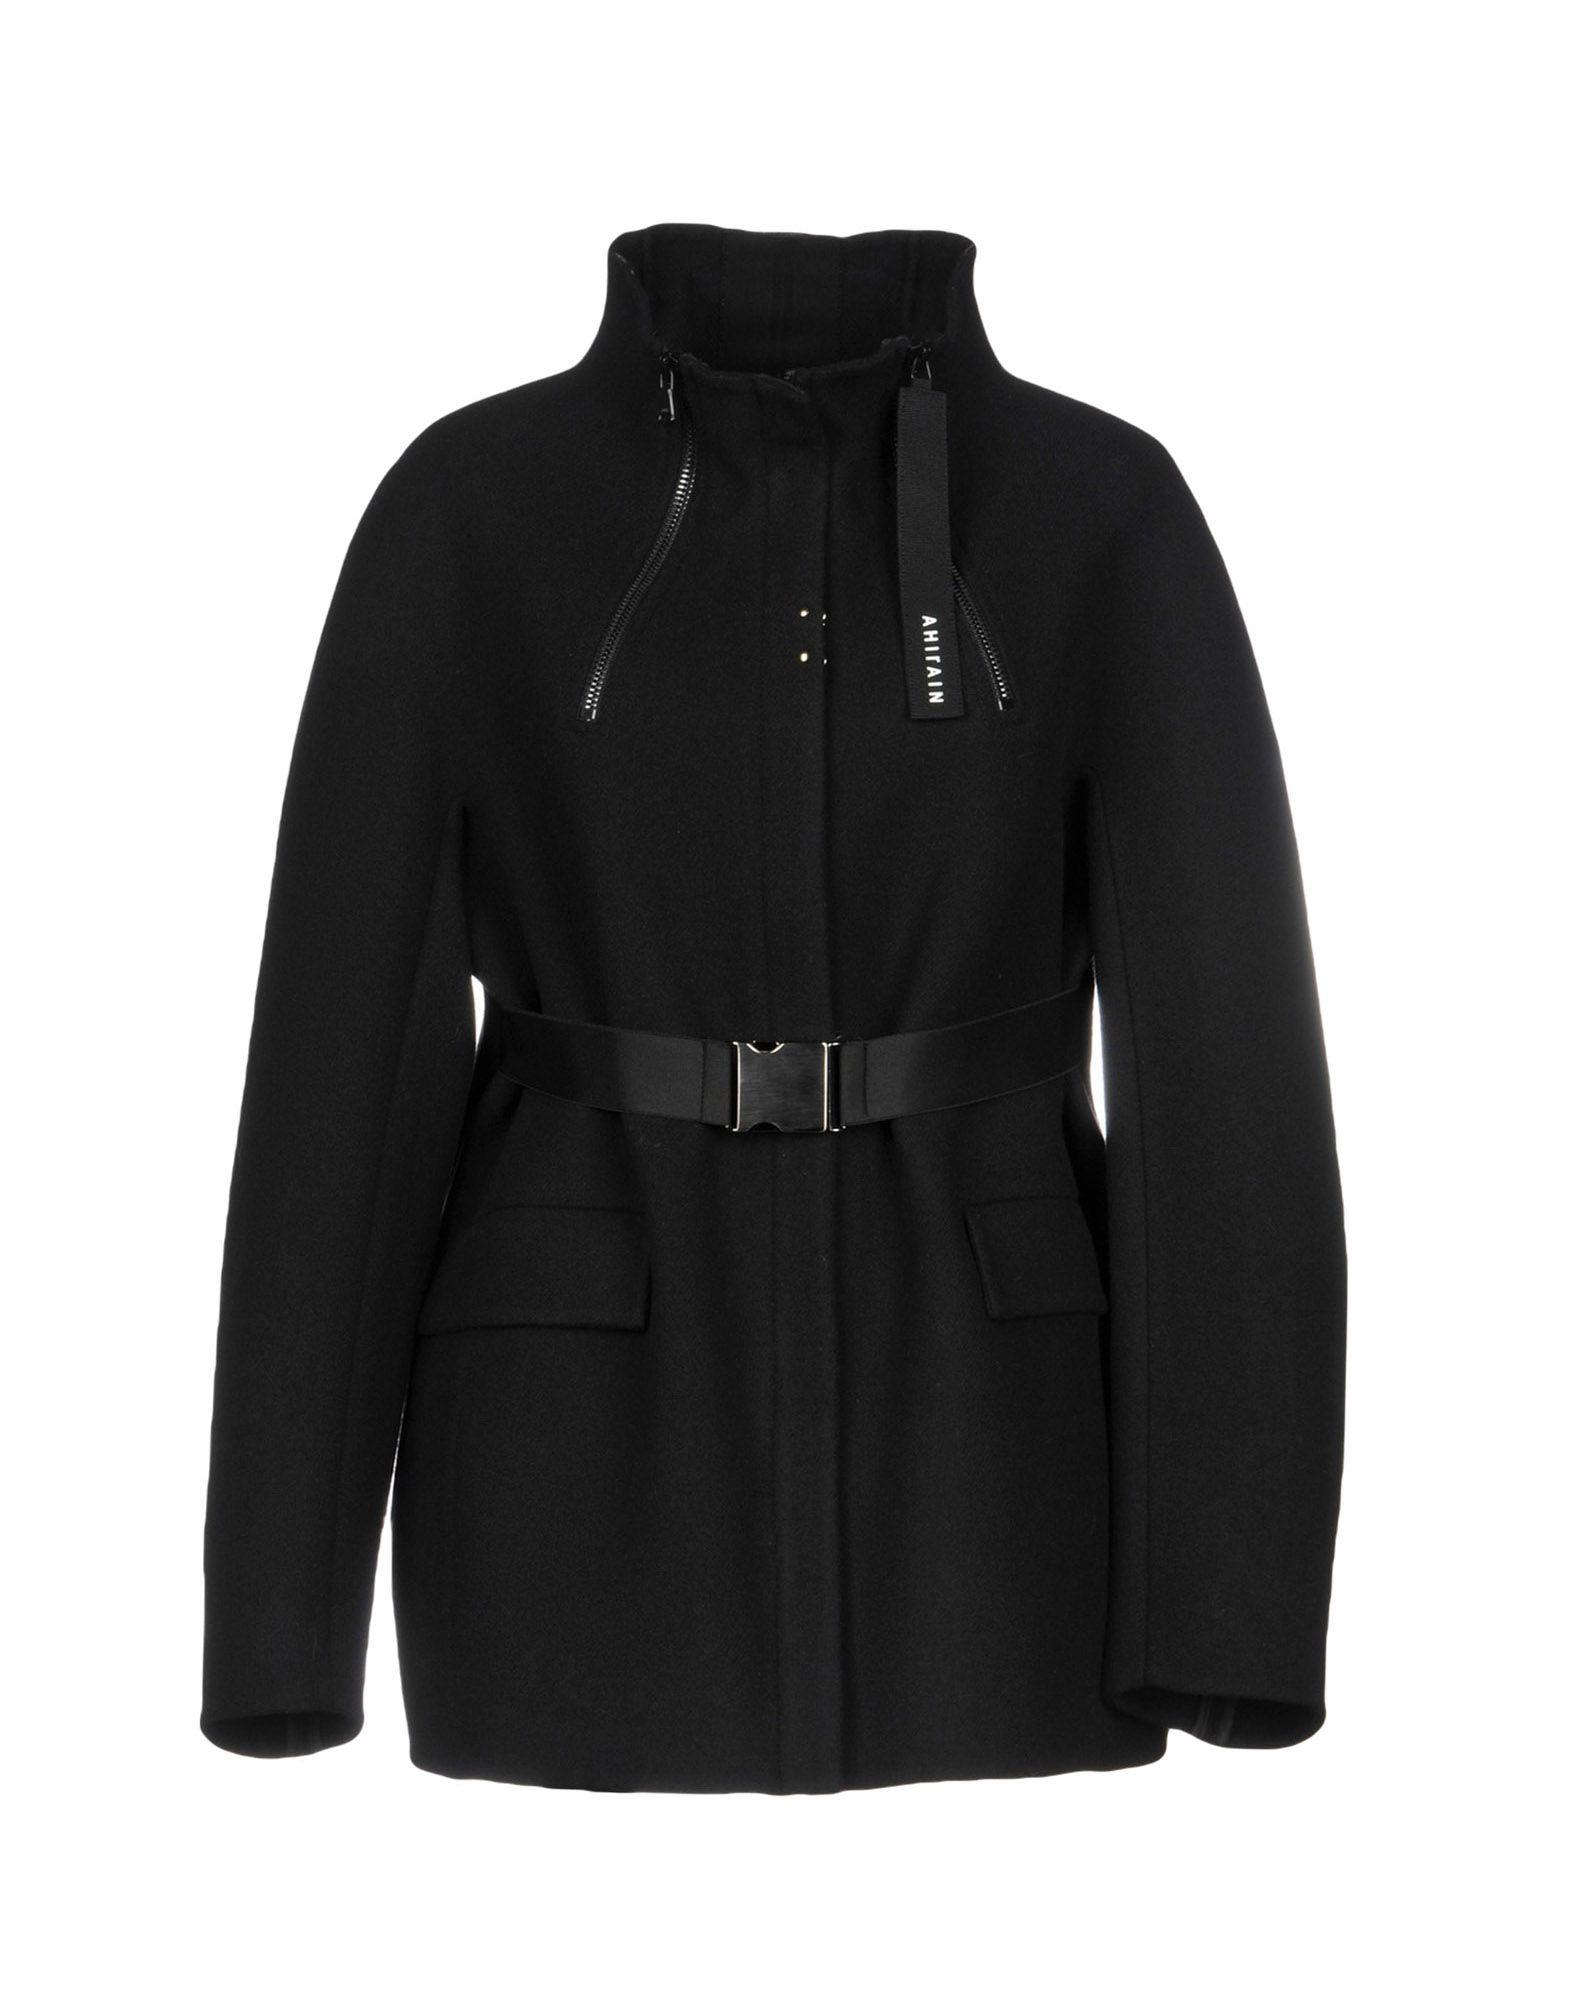 AHIRAIN Coat in Black